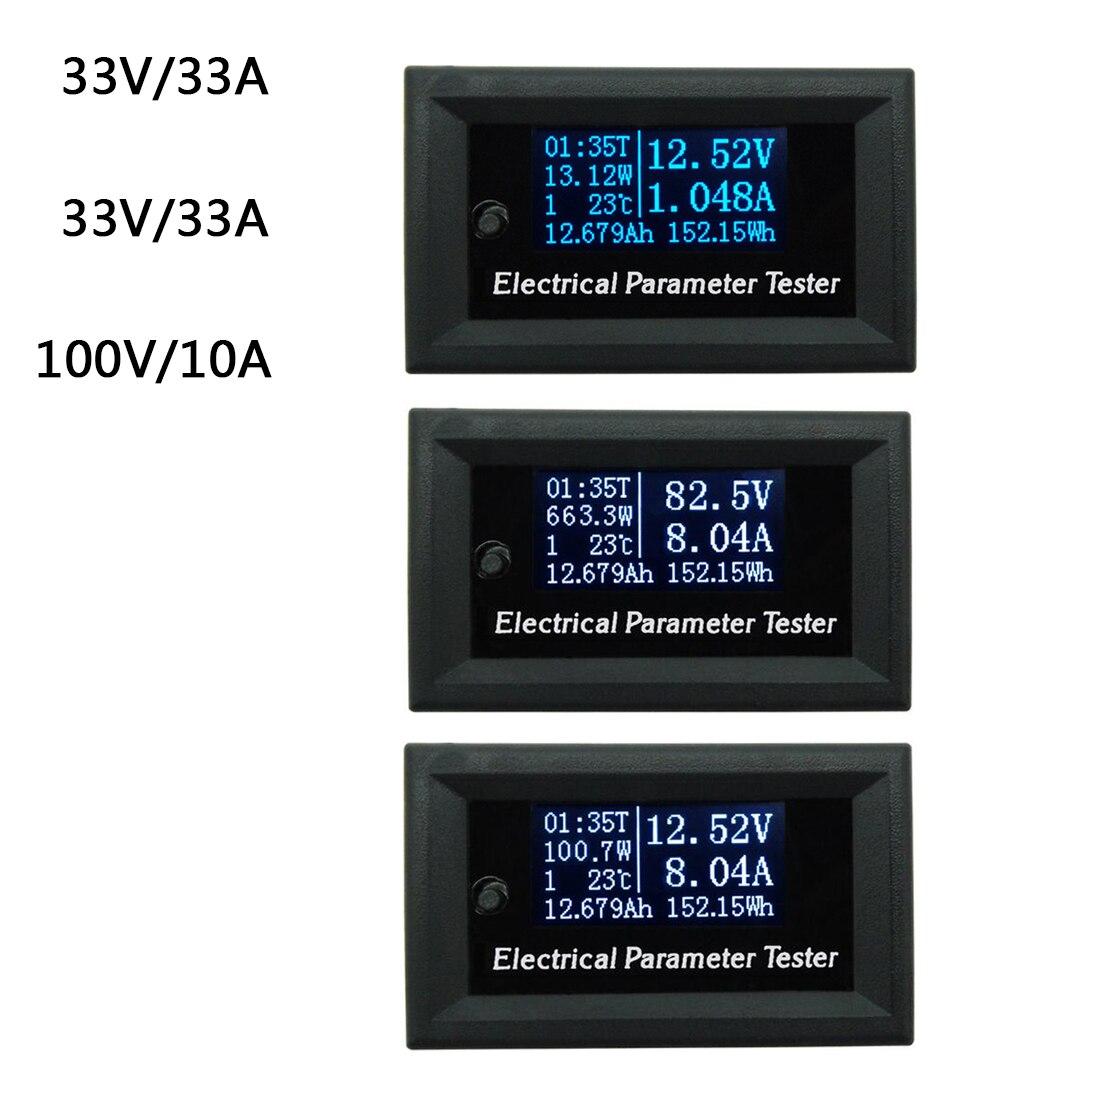 Hot!Oled LCD 33v 100V 10A DC Combo Meter Voltage Current Power Capacity Battery Monitor 28x46mm 2500pcs zmm33v ll 34 zmm 33v 1 2w 1206 33v 0 5w smd